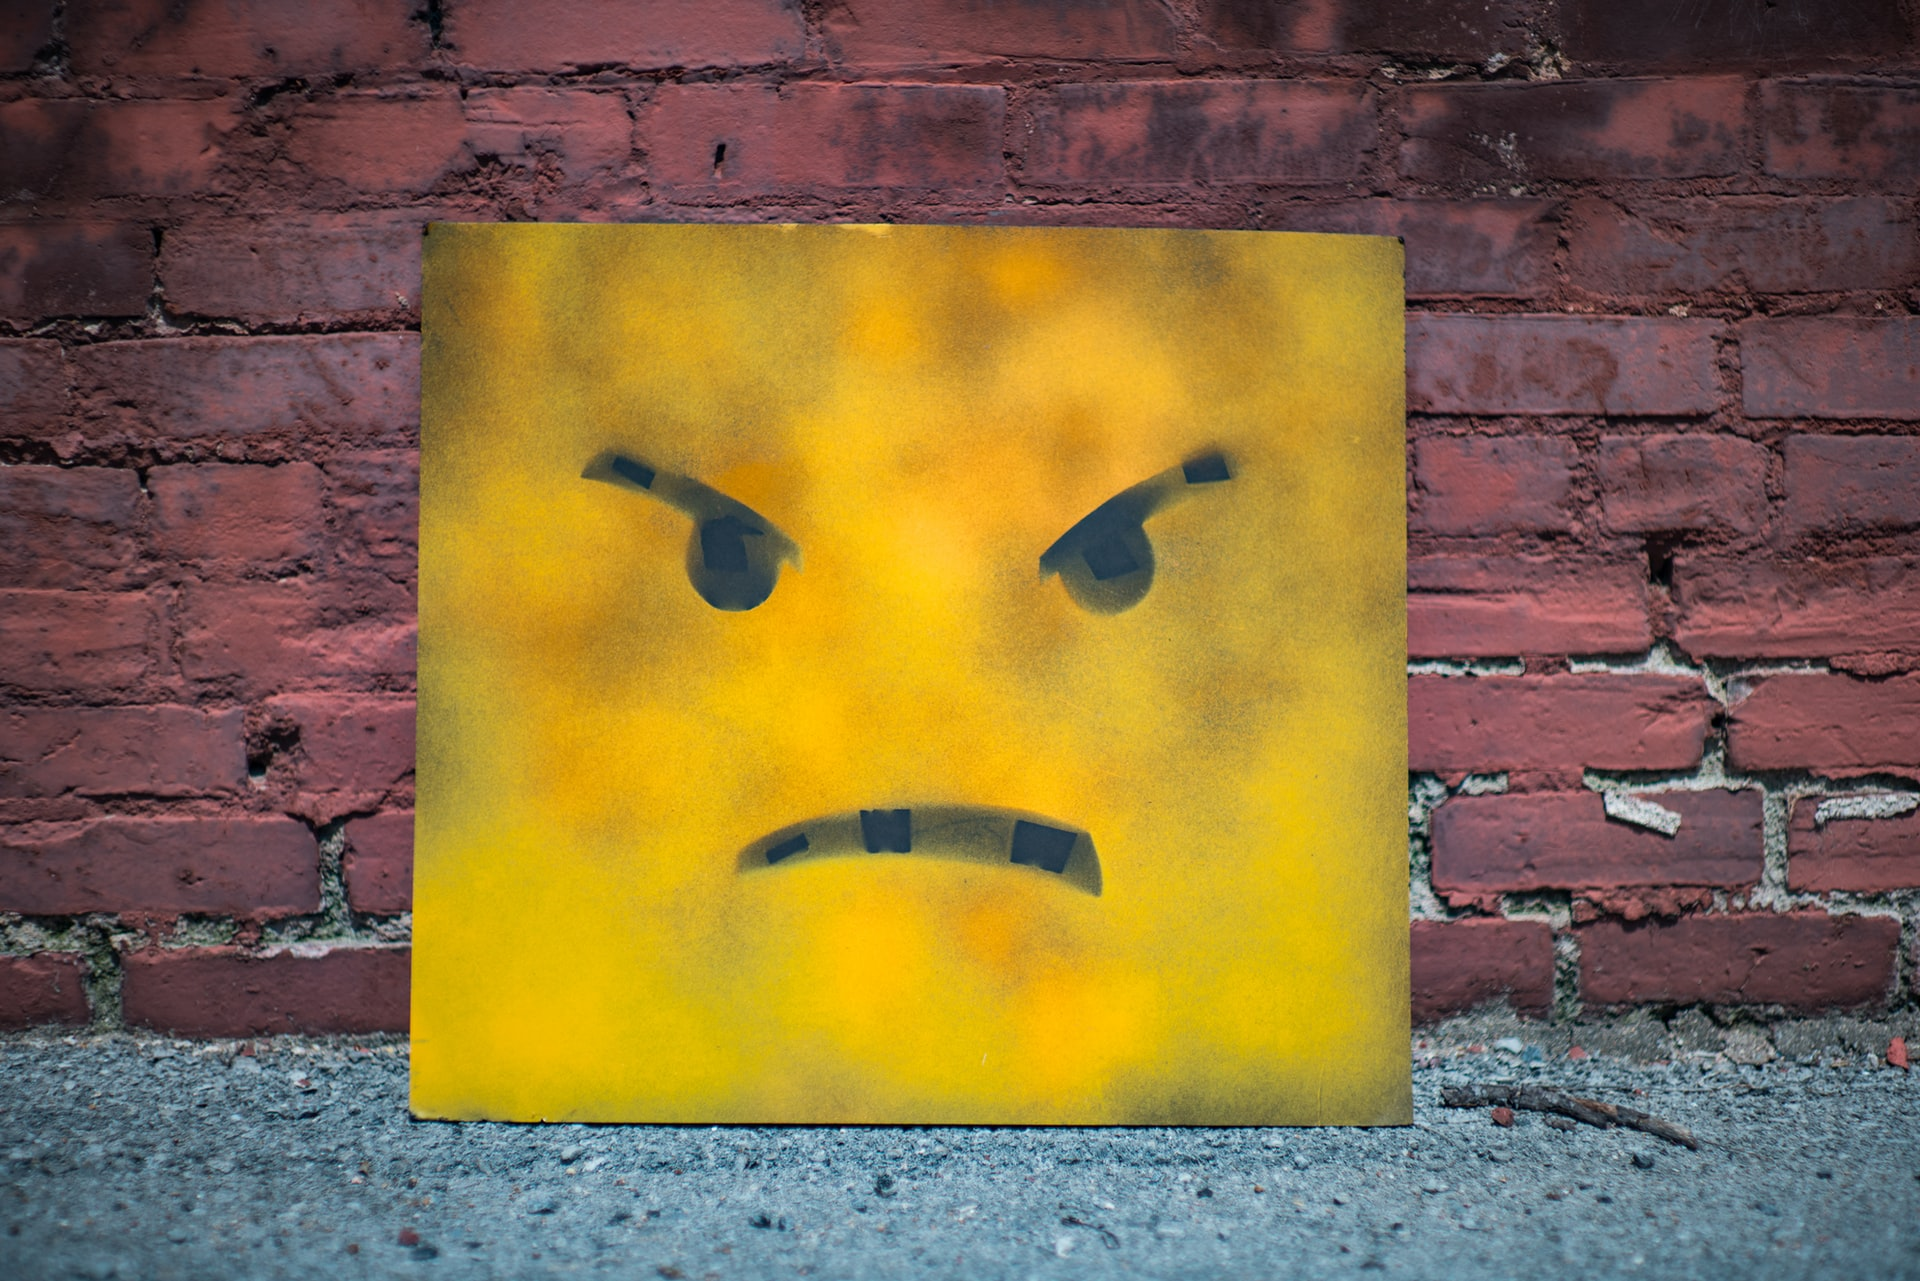 marketing mindset, target unhappy, mindset